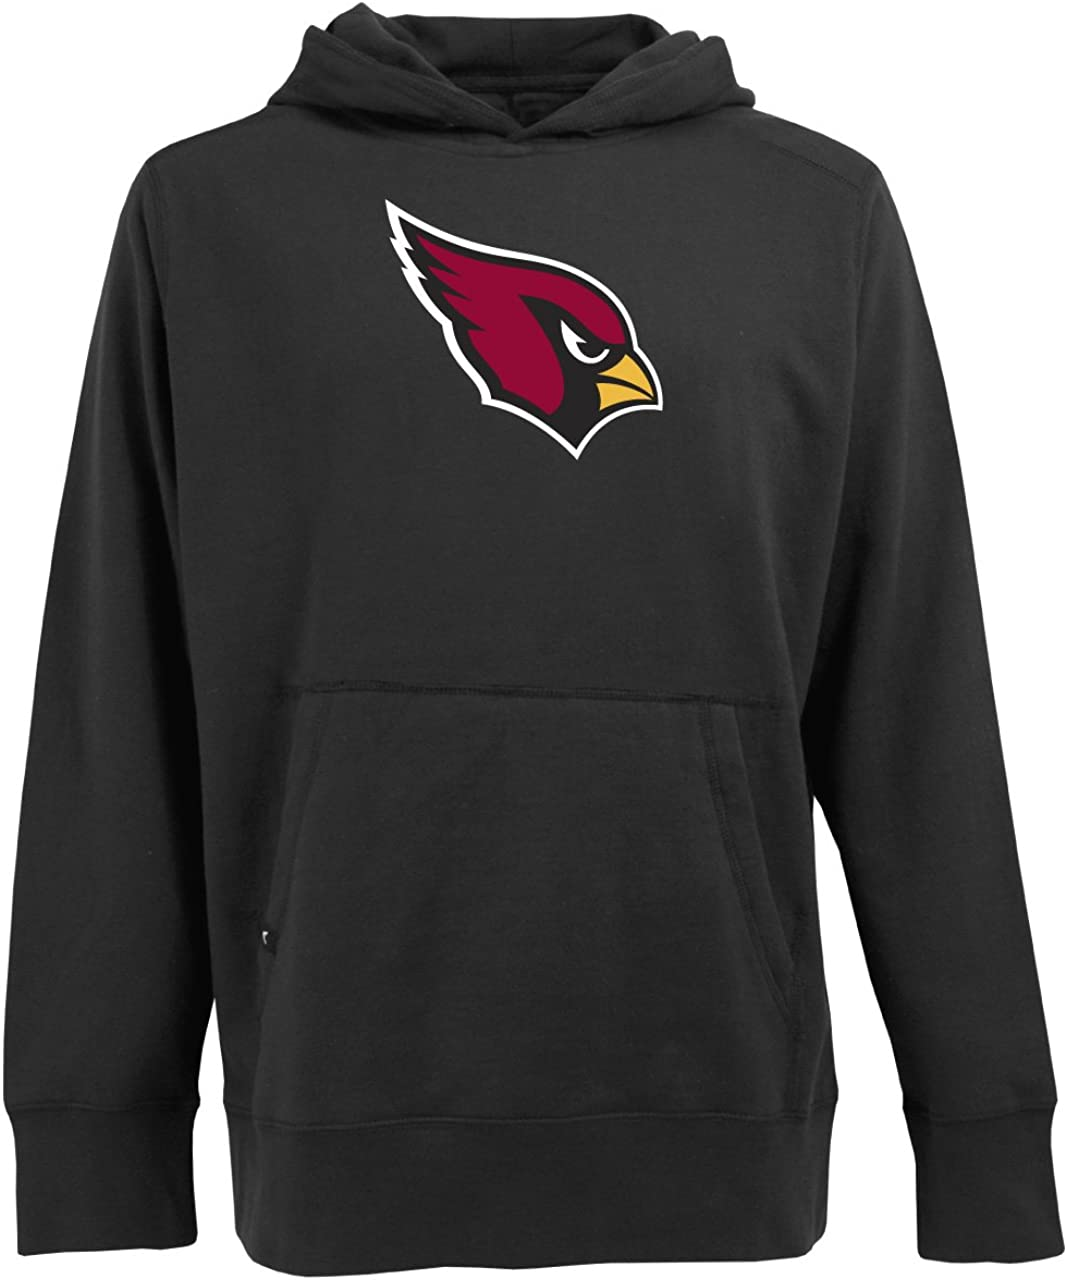 NFL Popular product Men's Arizona Cardinals Easy-to-use Hooded Signature Sweatshirt